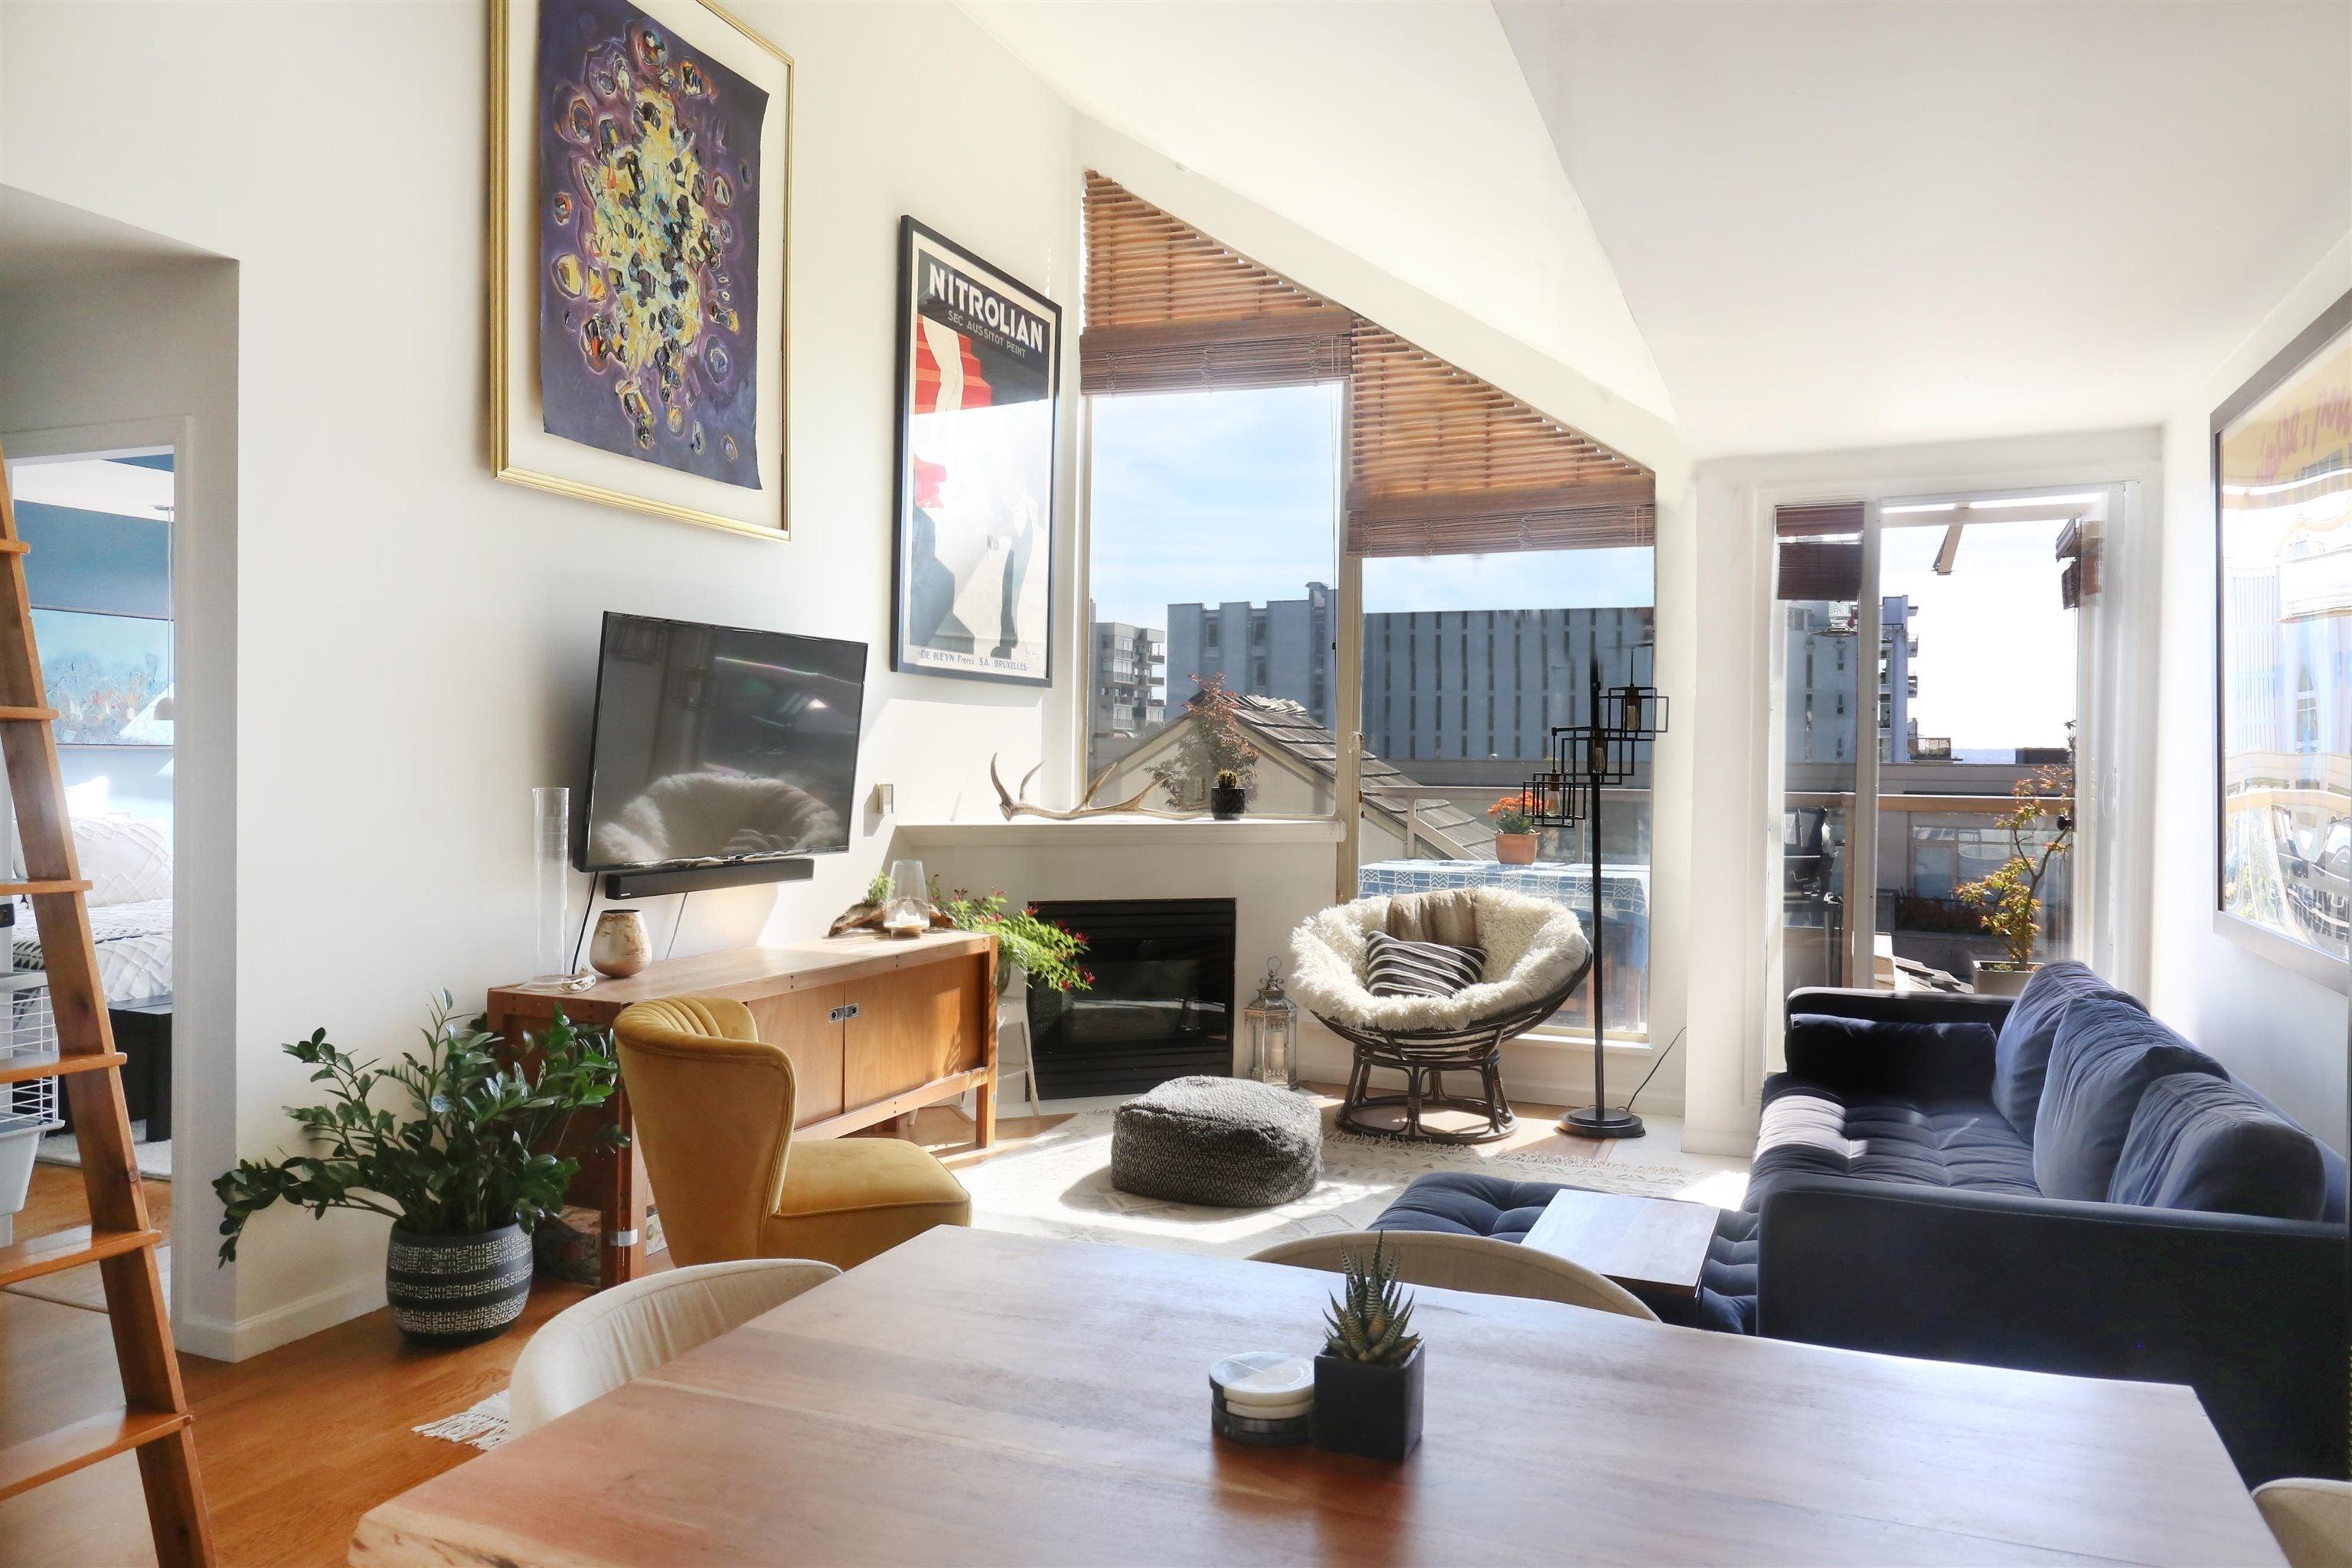 202 1871 MARINE DRIVE - Ambleside Apartment/Condo for sale, 2 Bedrooms (R2618796) - #1